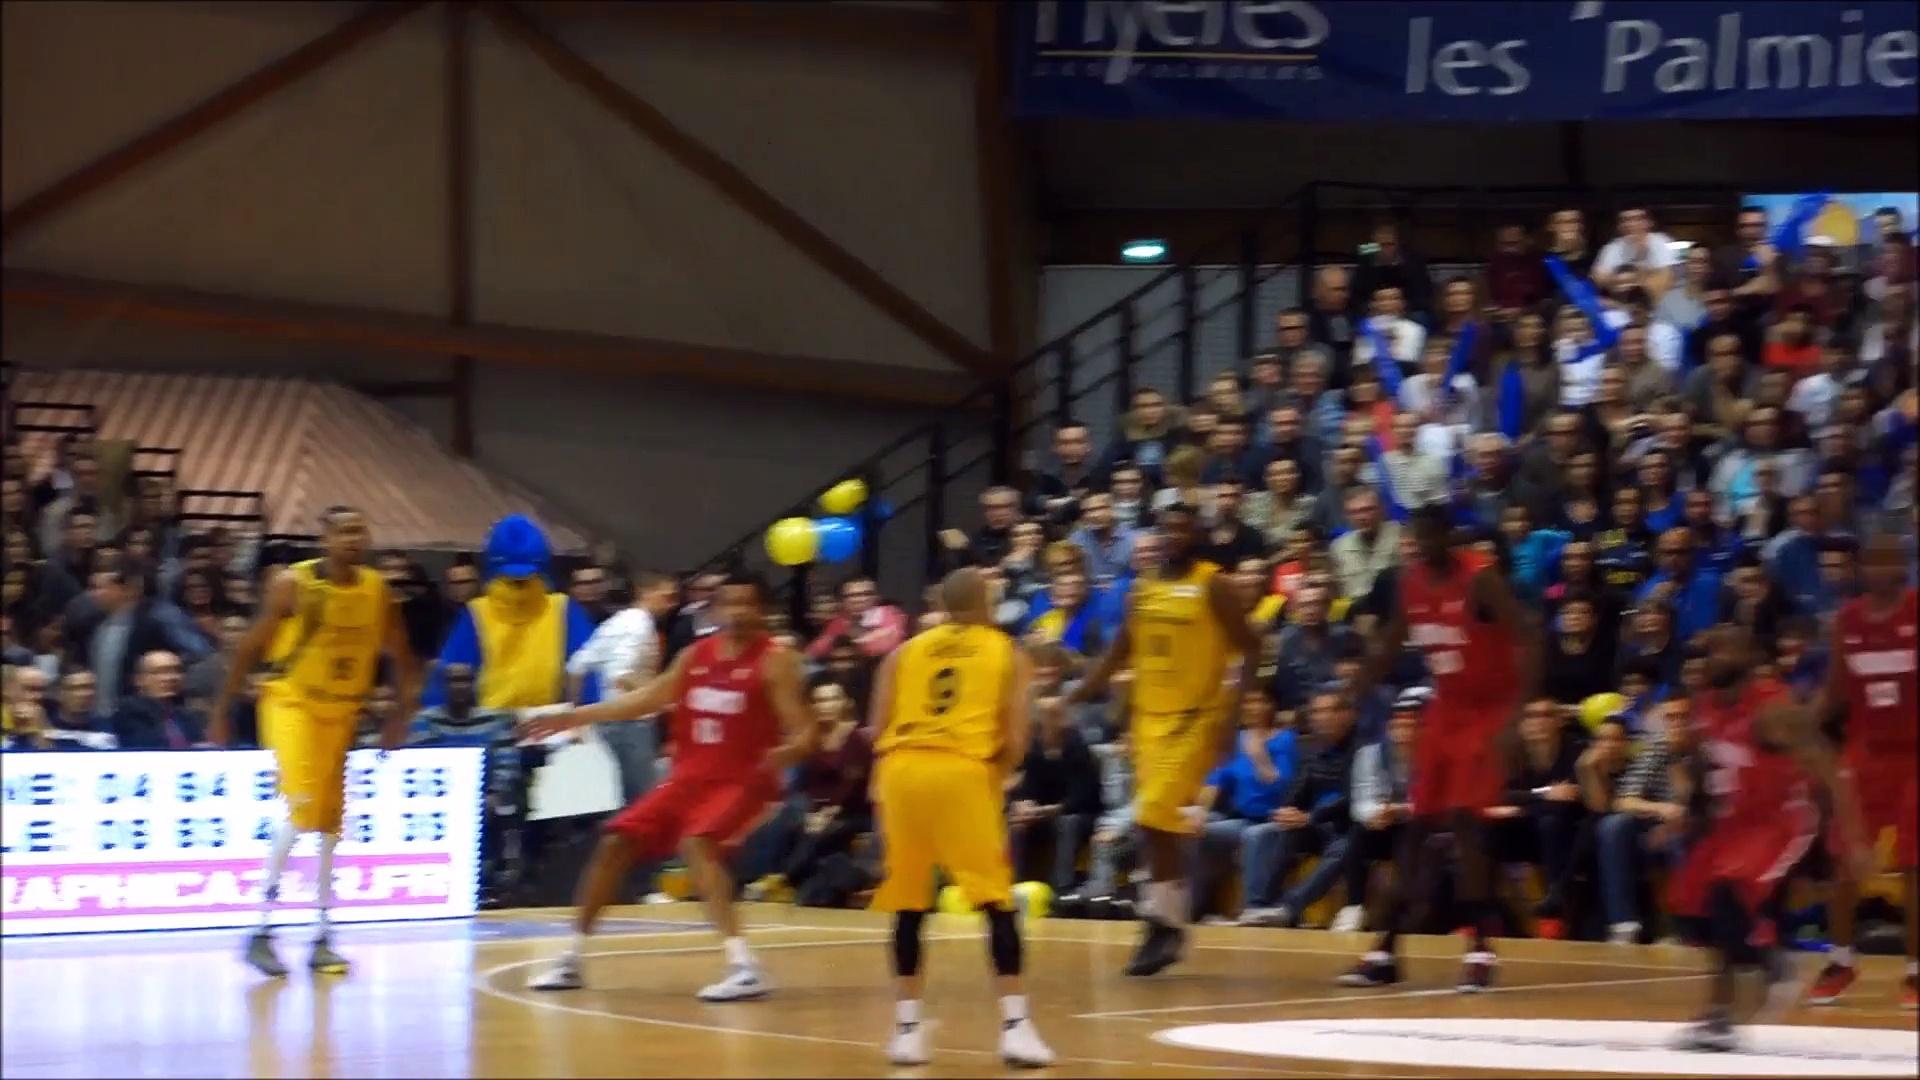 Ludovic CHELLE HTV BASKETBALL Highlights